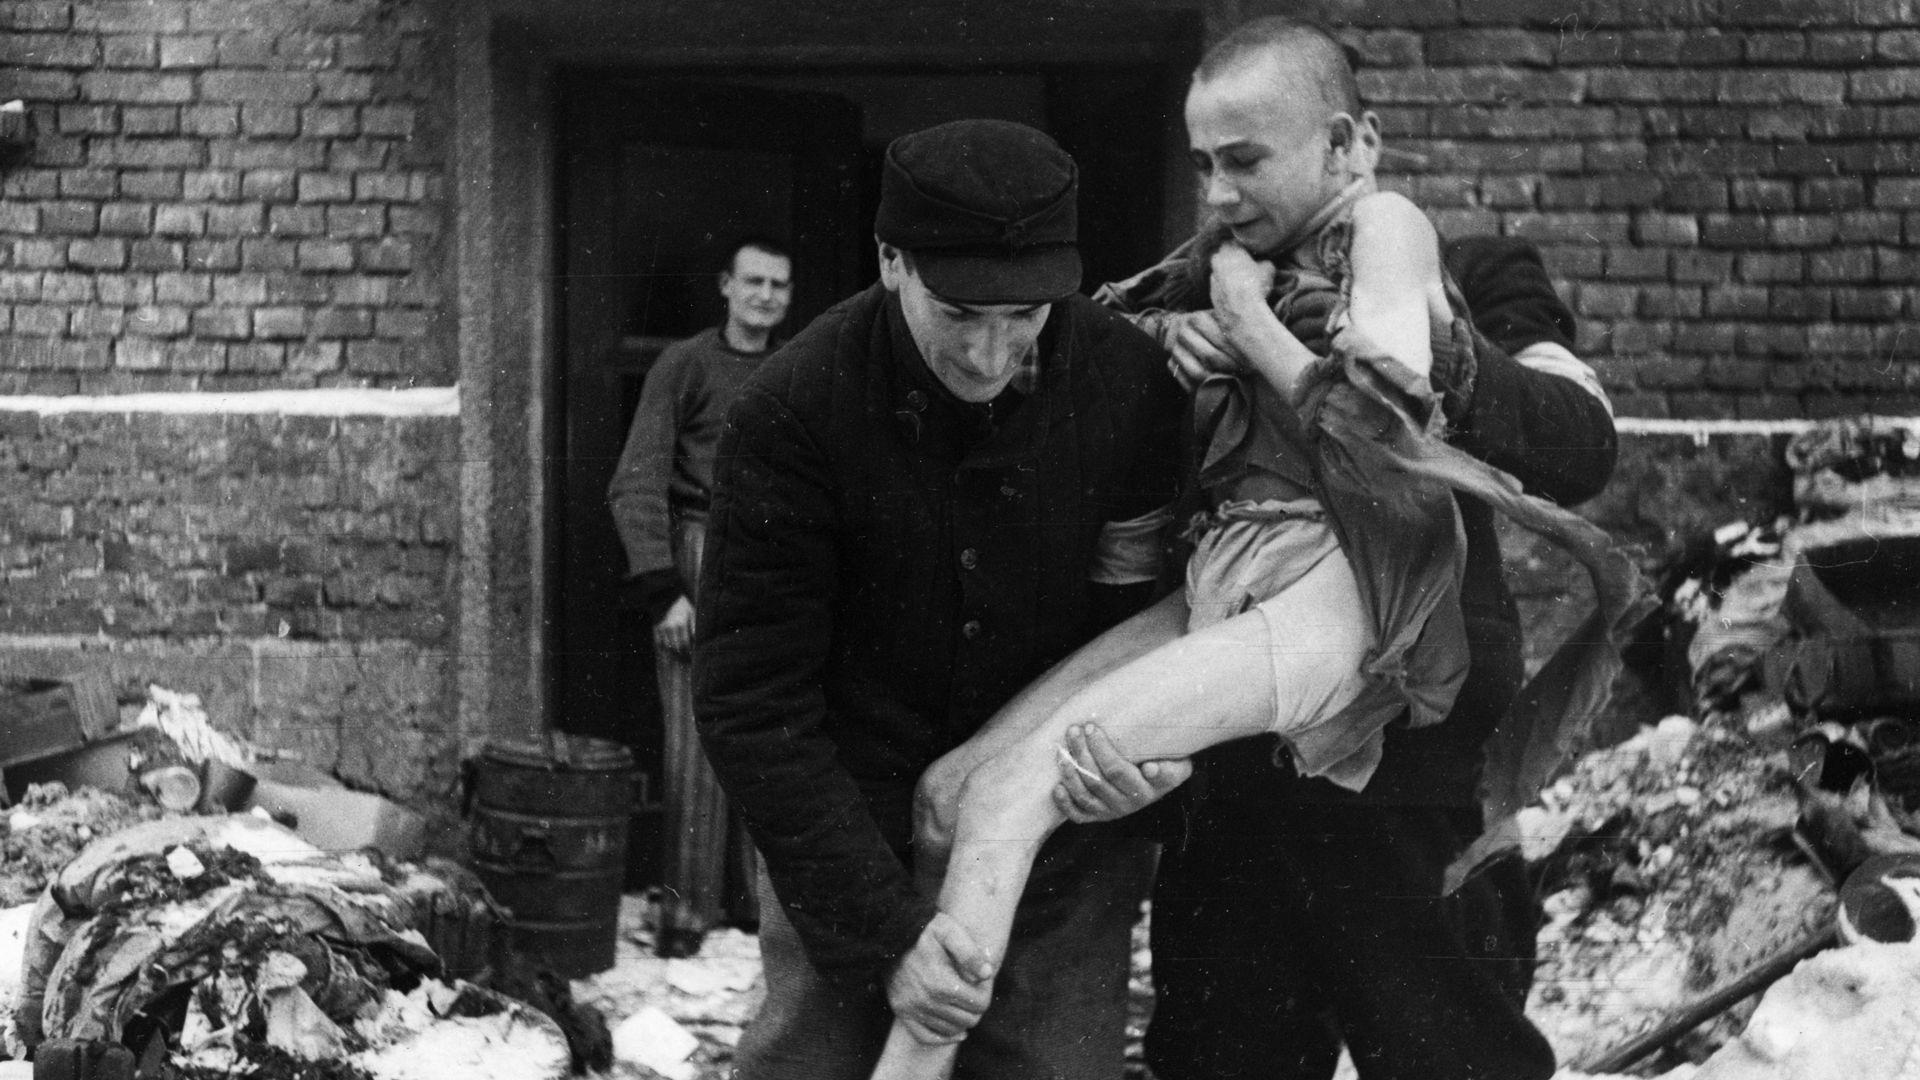 Auschwitz Photos Taken After Its Liberation Reveal Devastating Atrocities